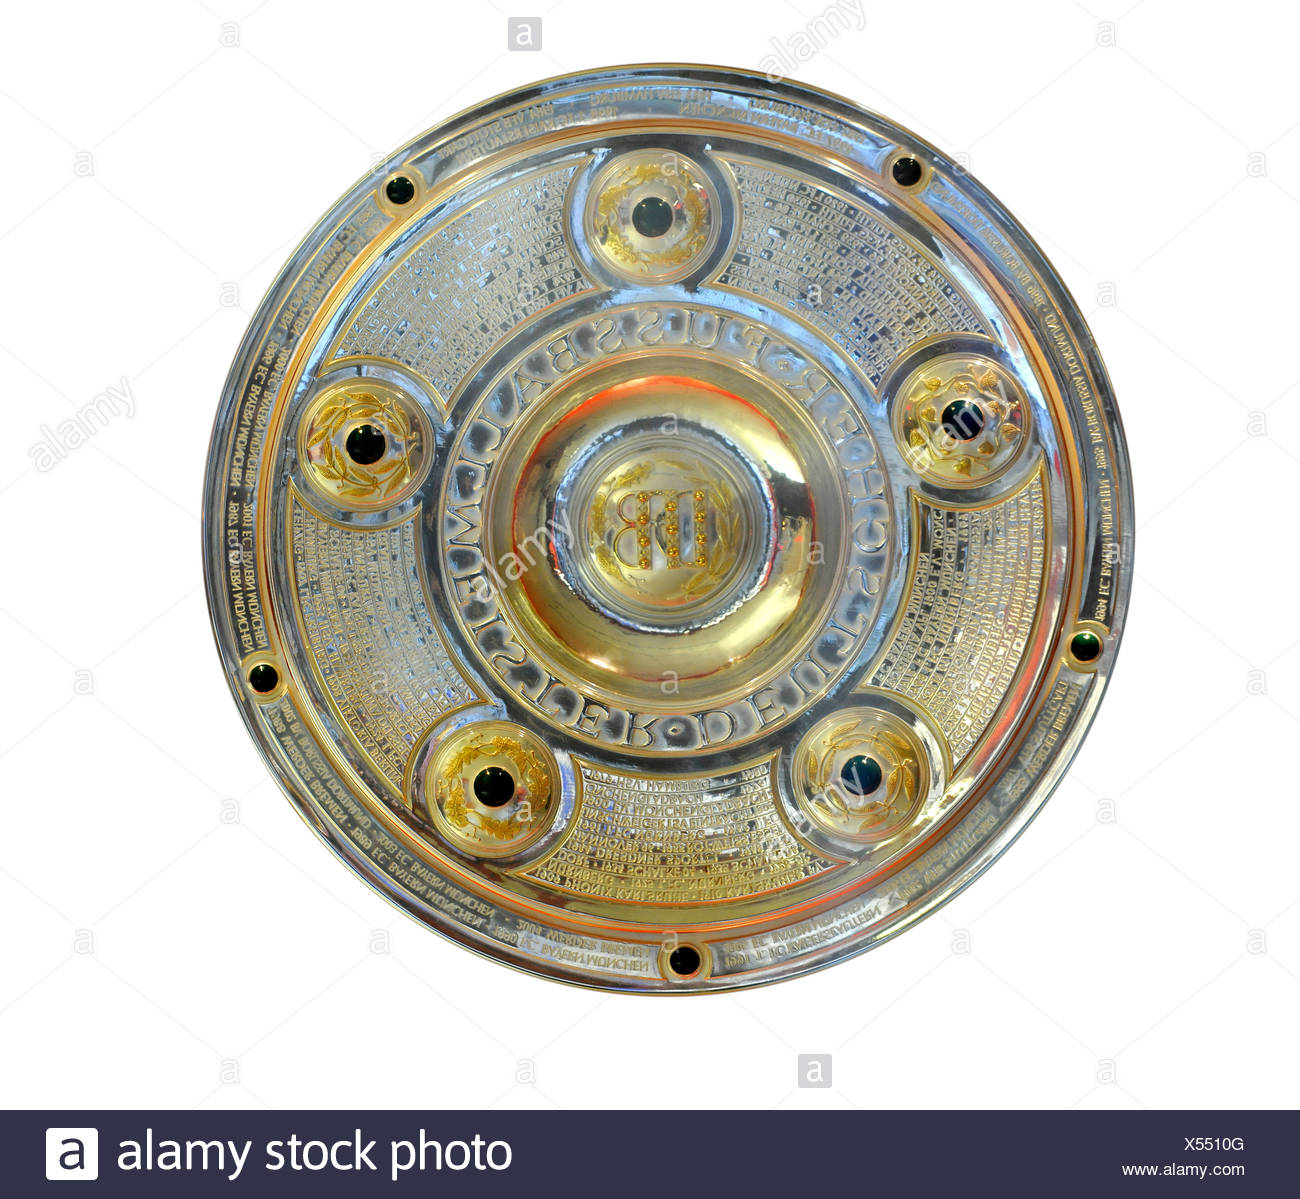 Meisterschale, Deutsche Bundesliga German football league championship trophy, cut-out - Stock Image